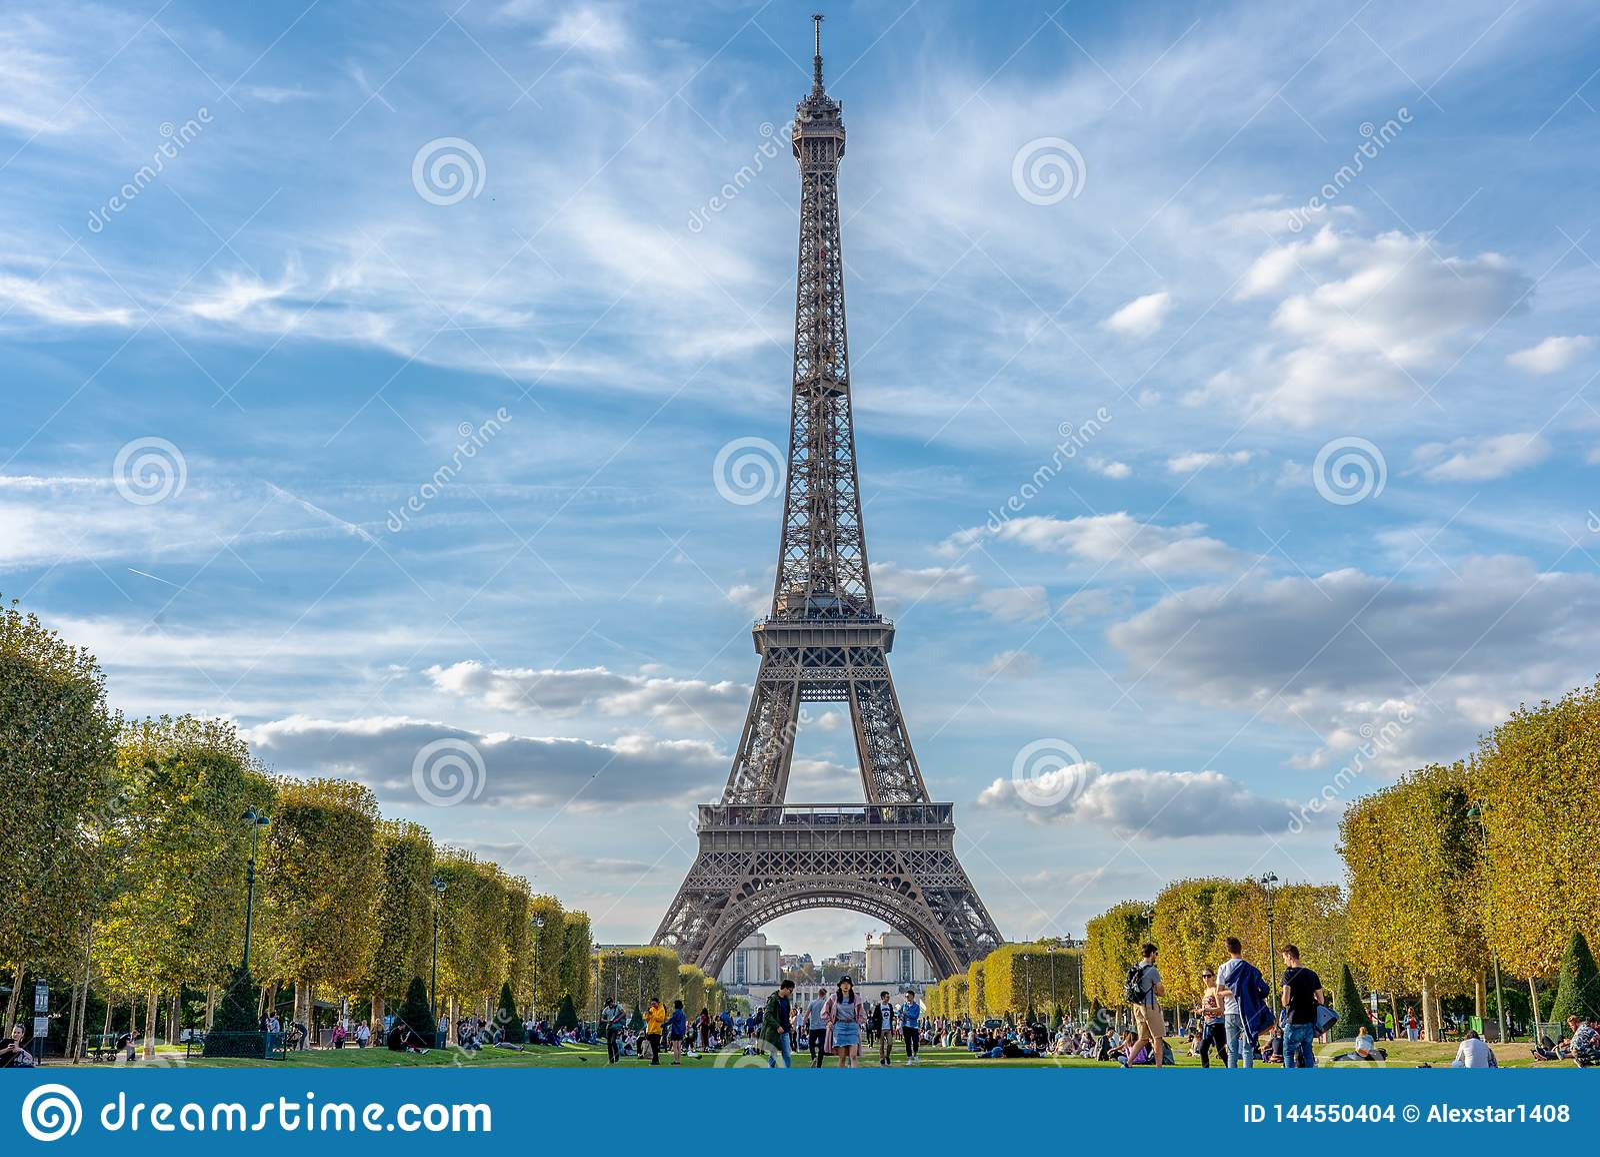 Eiffel Tower paris france cloudy sky